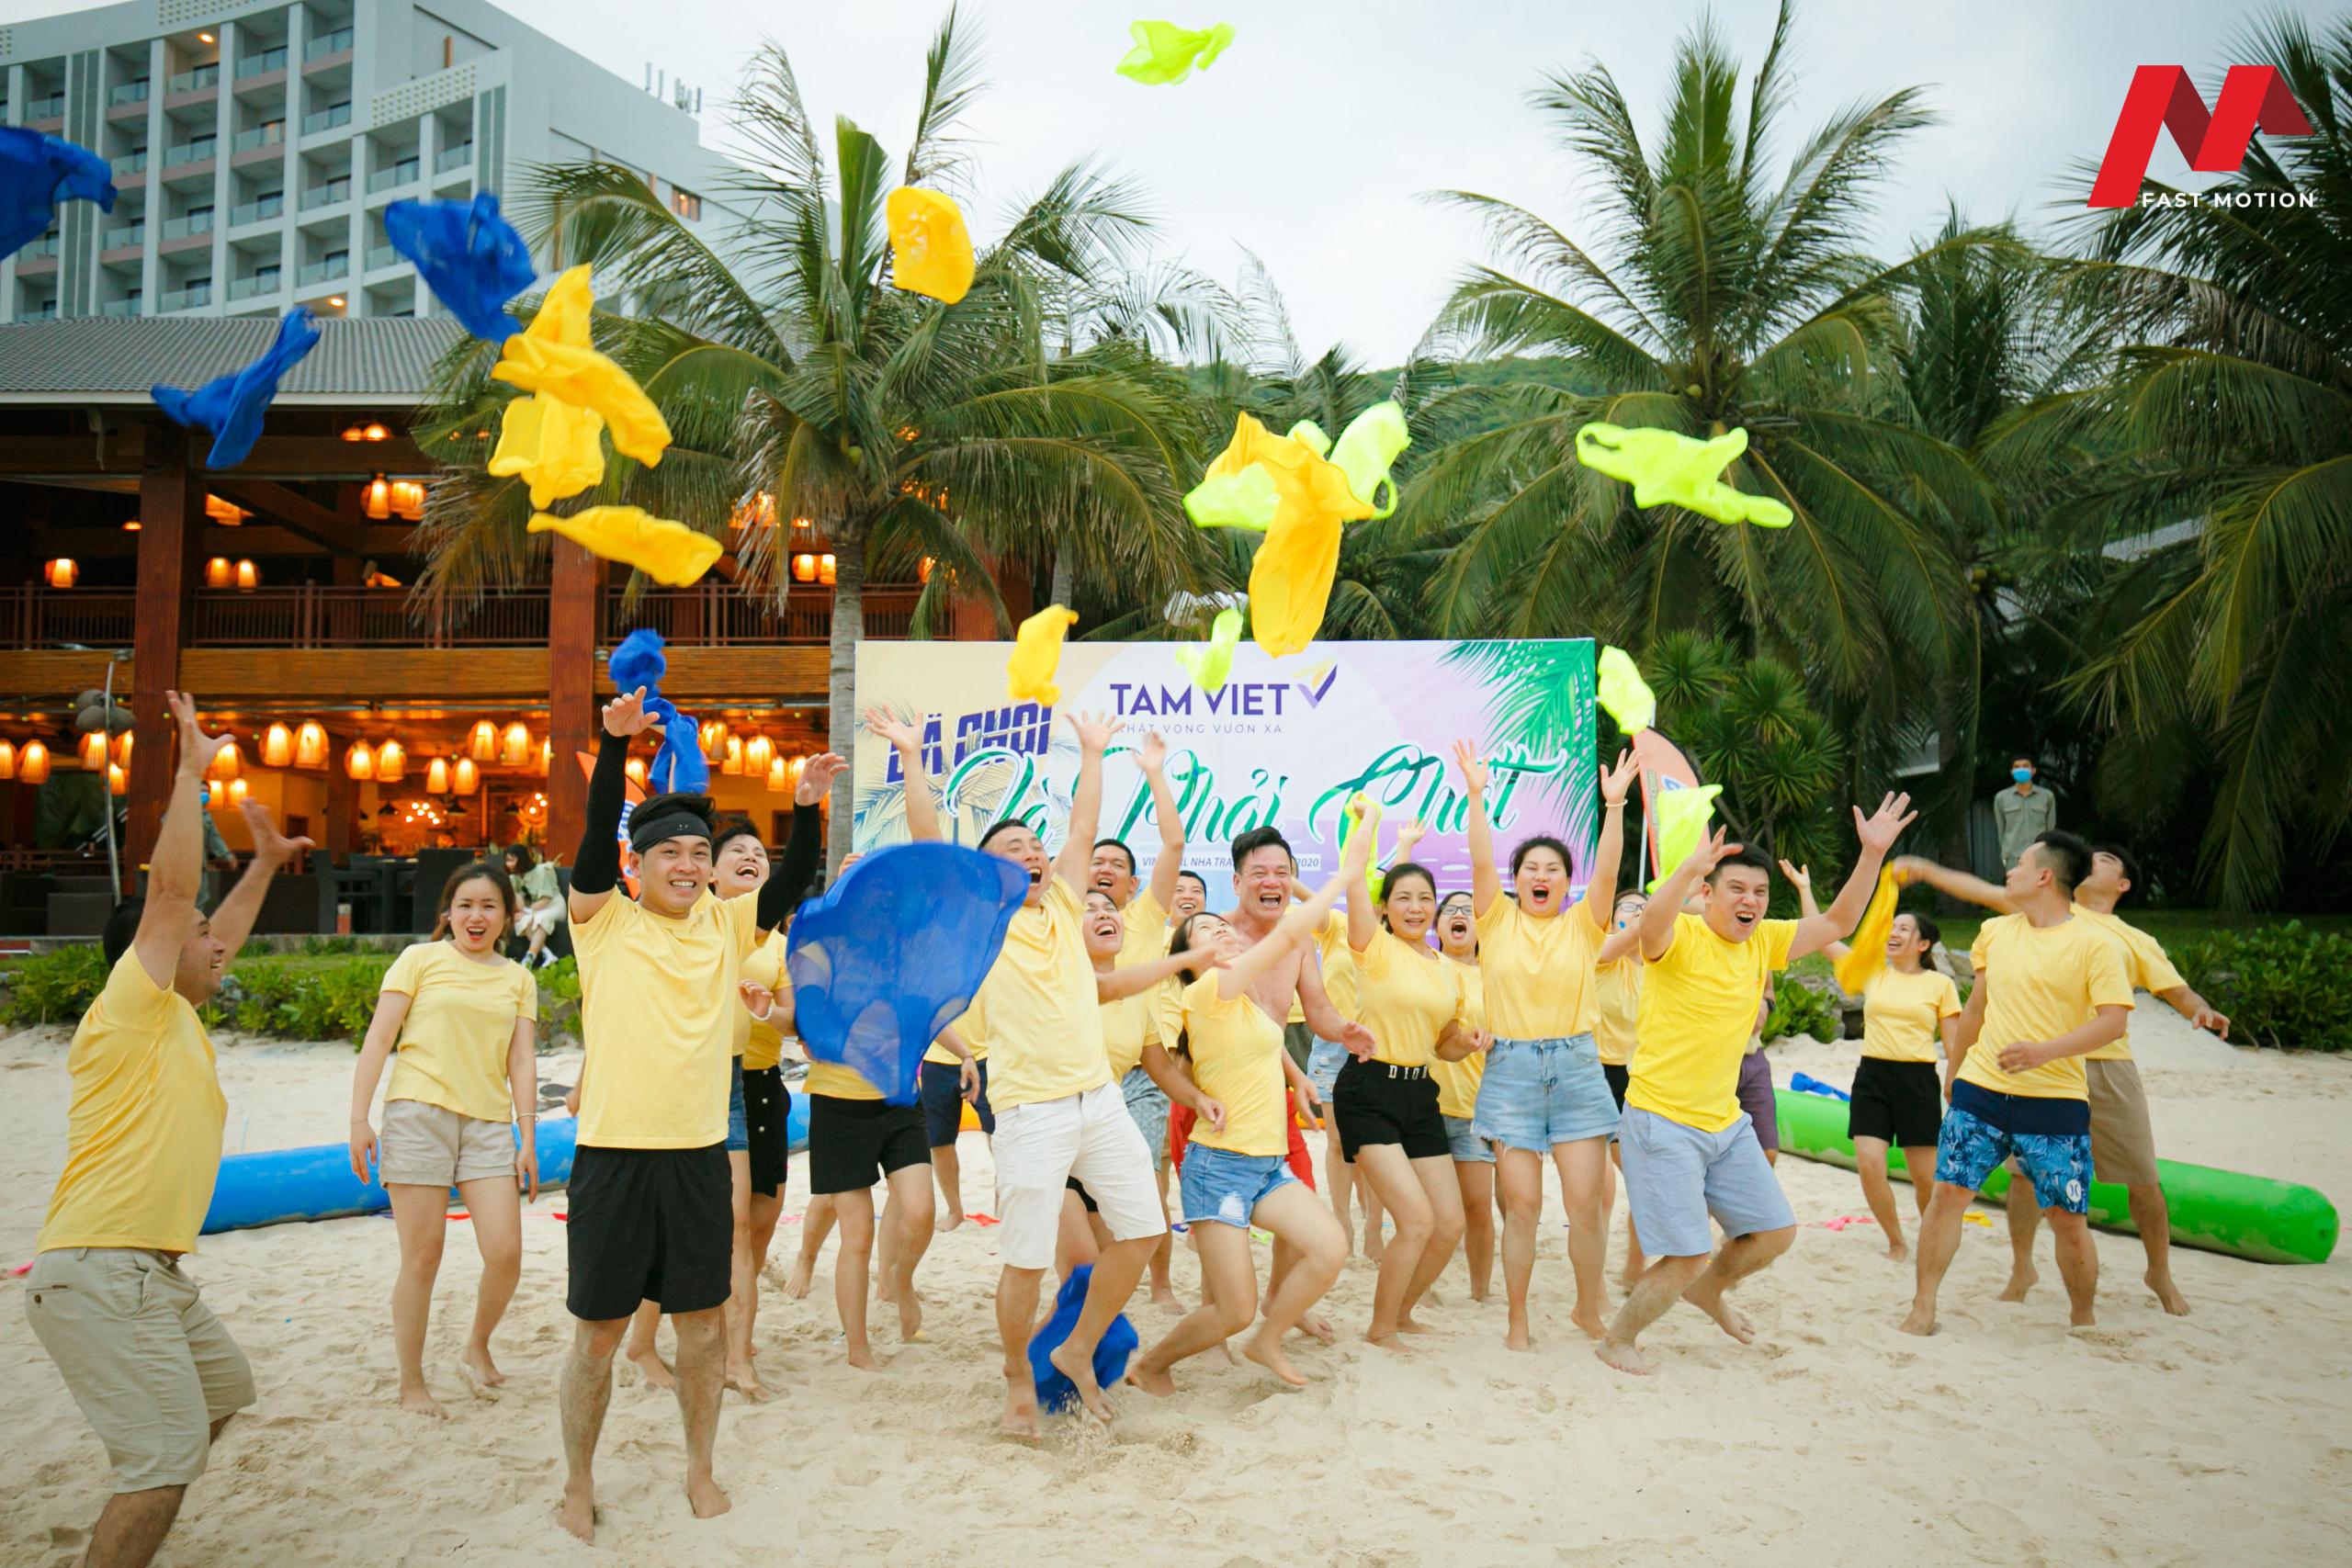 Quay phim teambuilding Nha Trang